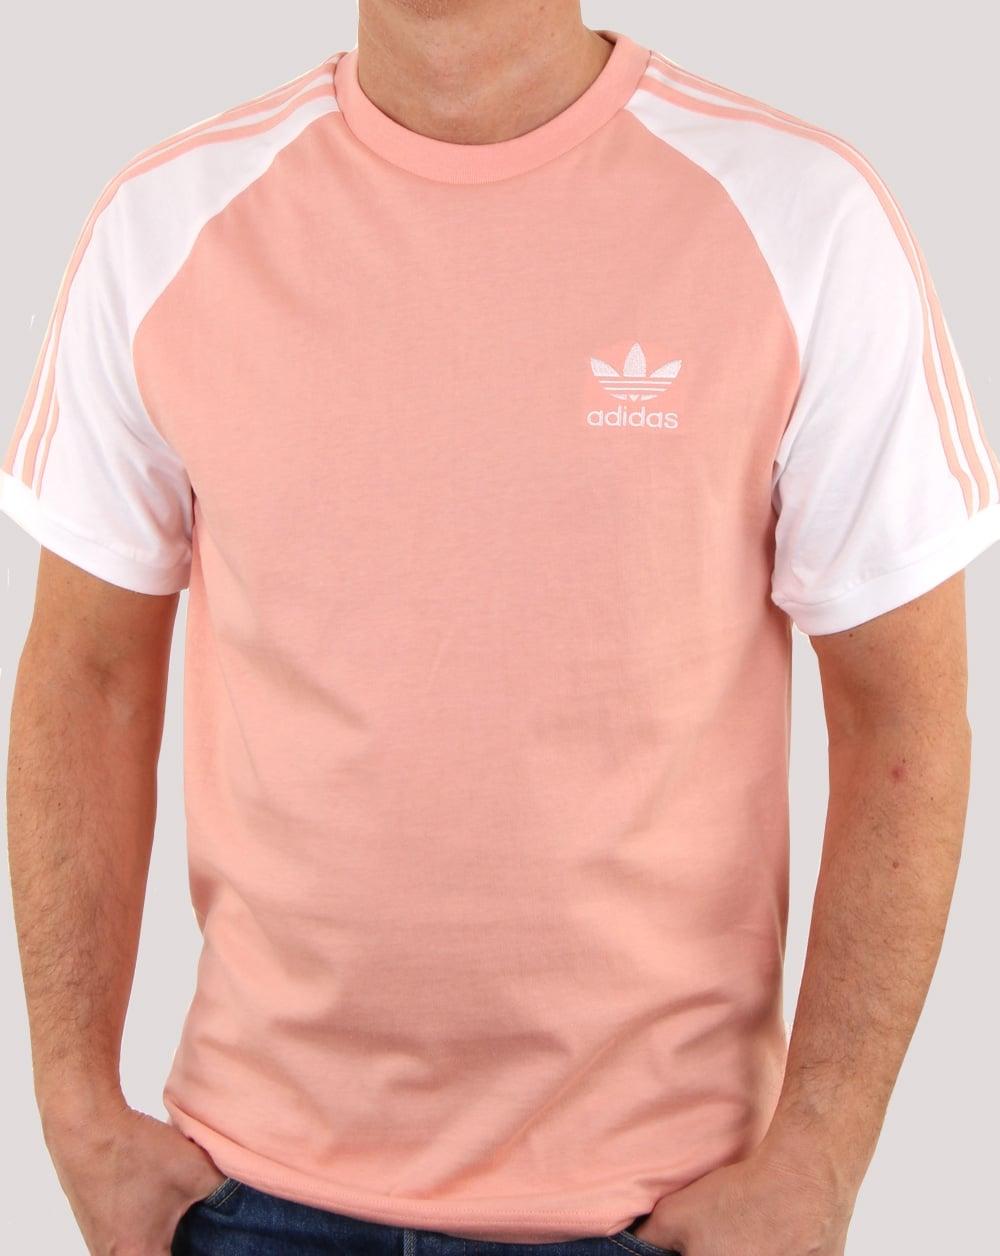 Shirt Tee Originals Stripe Adidas Mens Dust T crew 3 Stripes Pink xHnwq6I